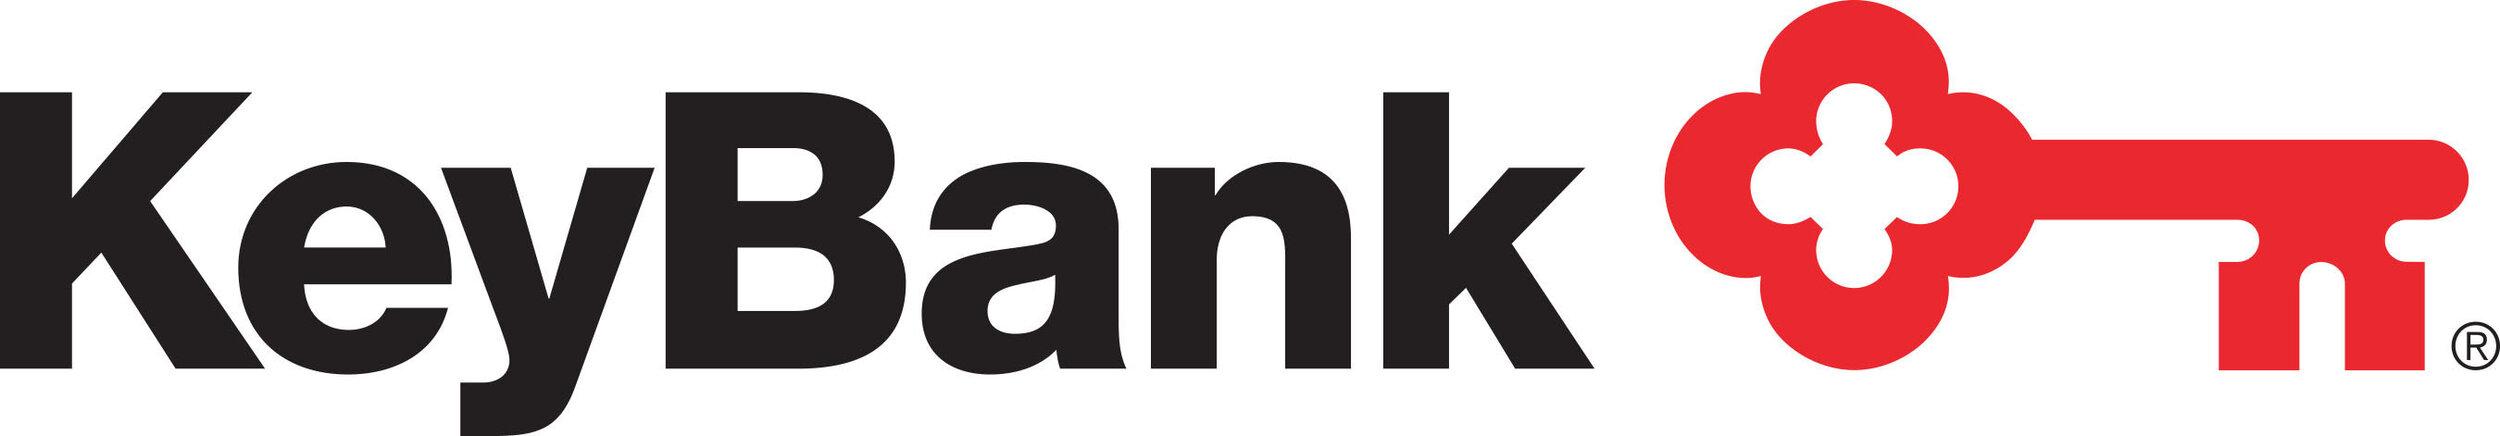 KeyBank-logo.jpeg